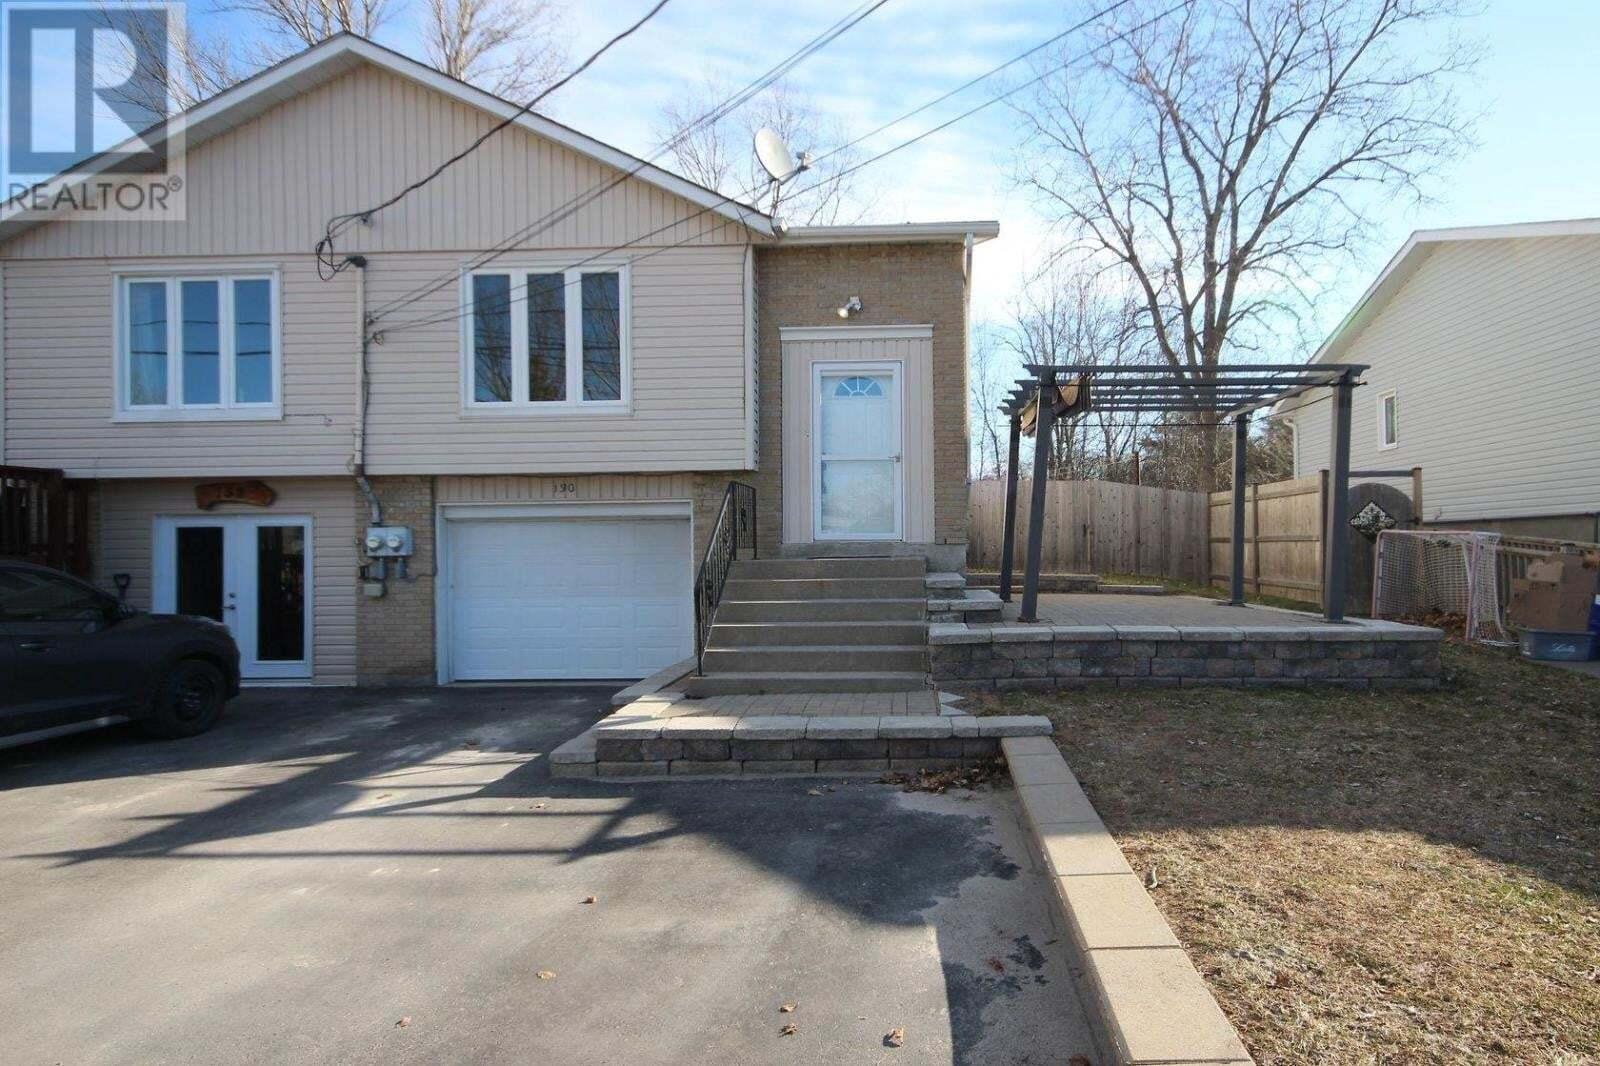 House for sale at 130 Sir John Johnson Dr Bath Ontario - MLS: K20002382